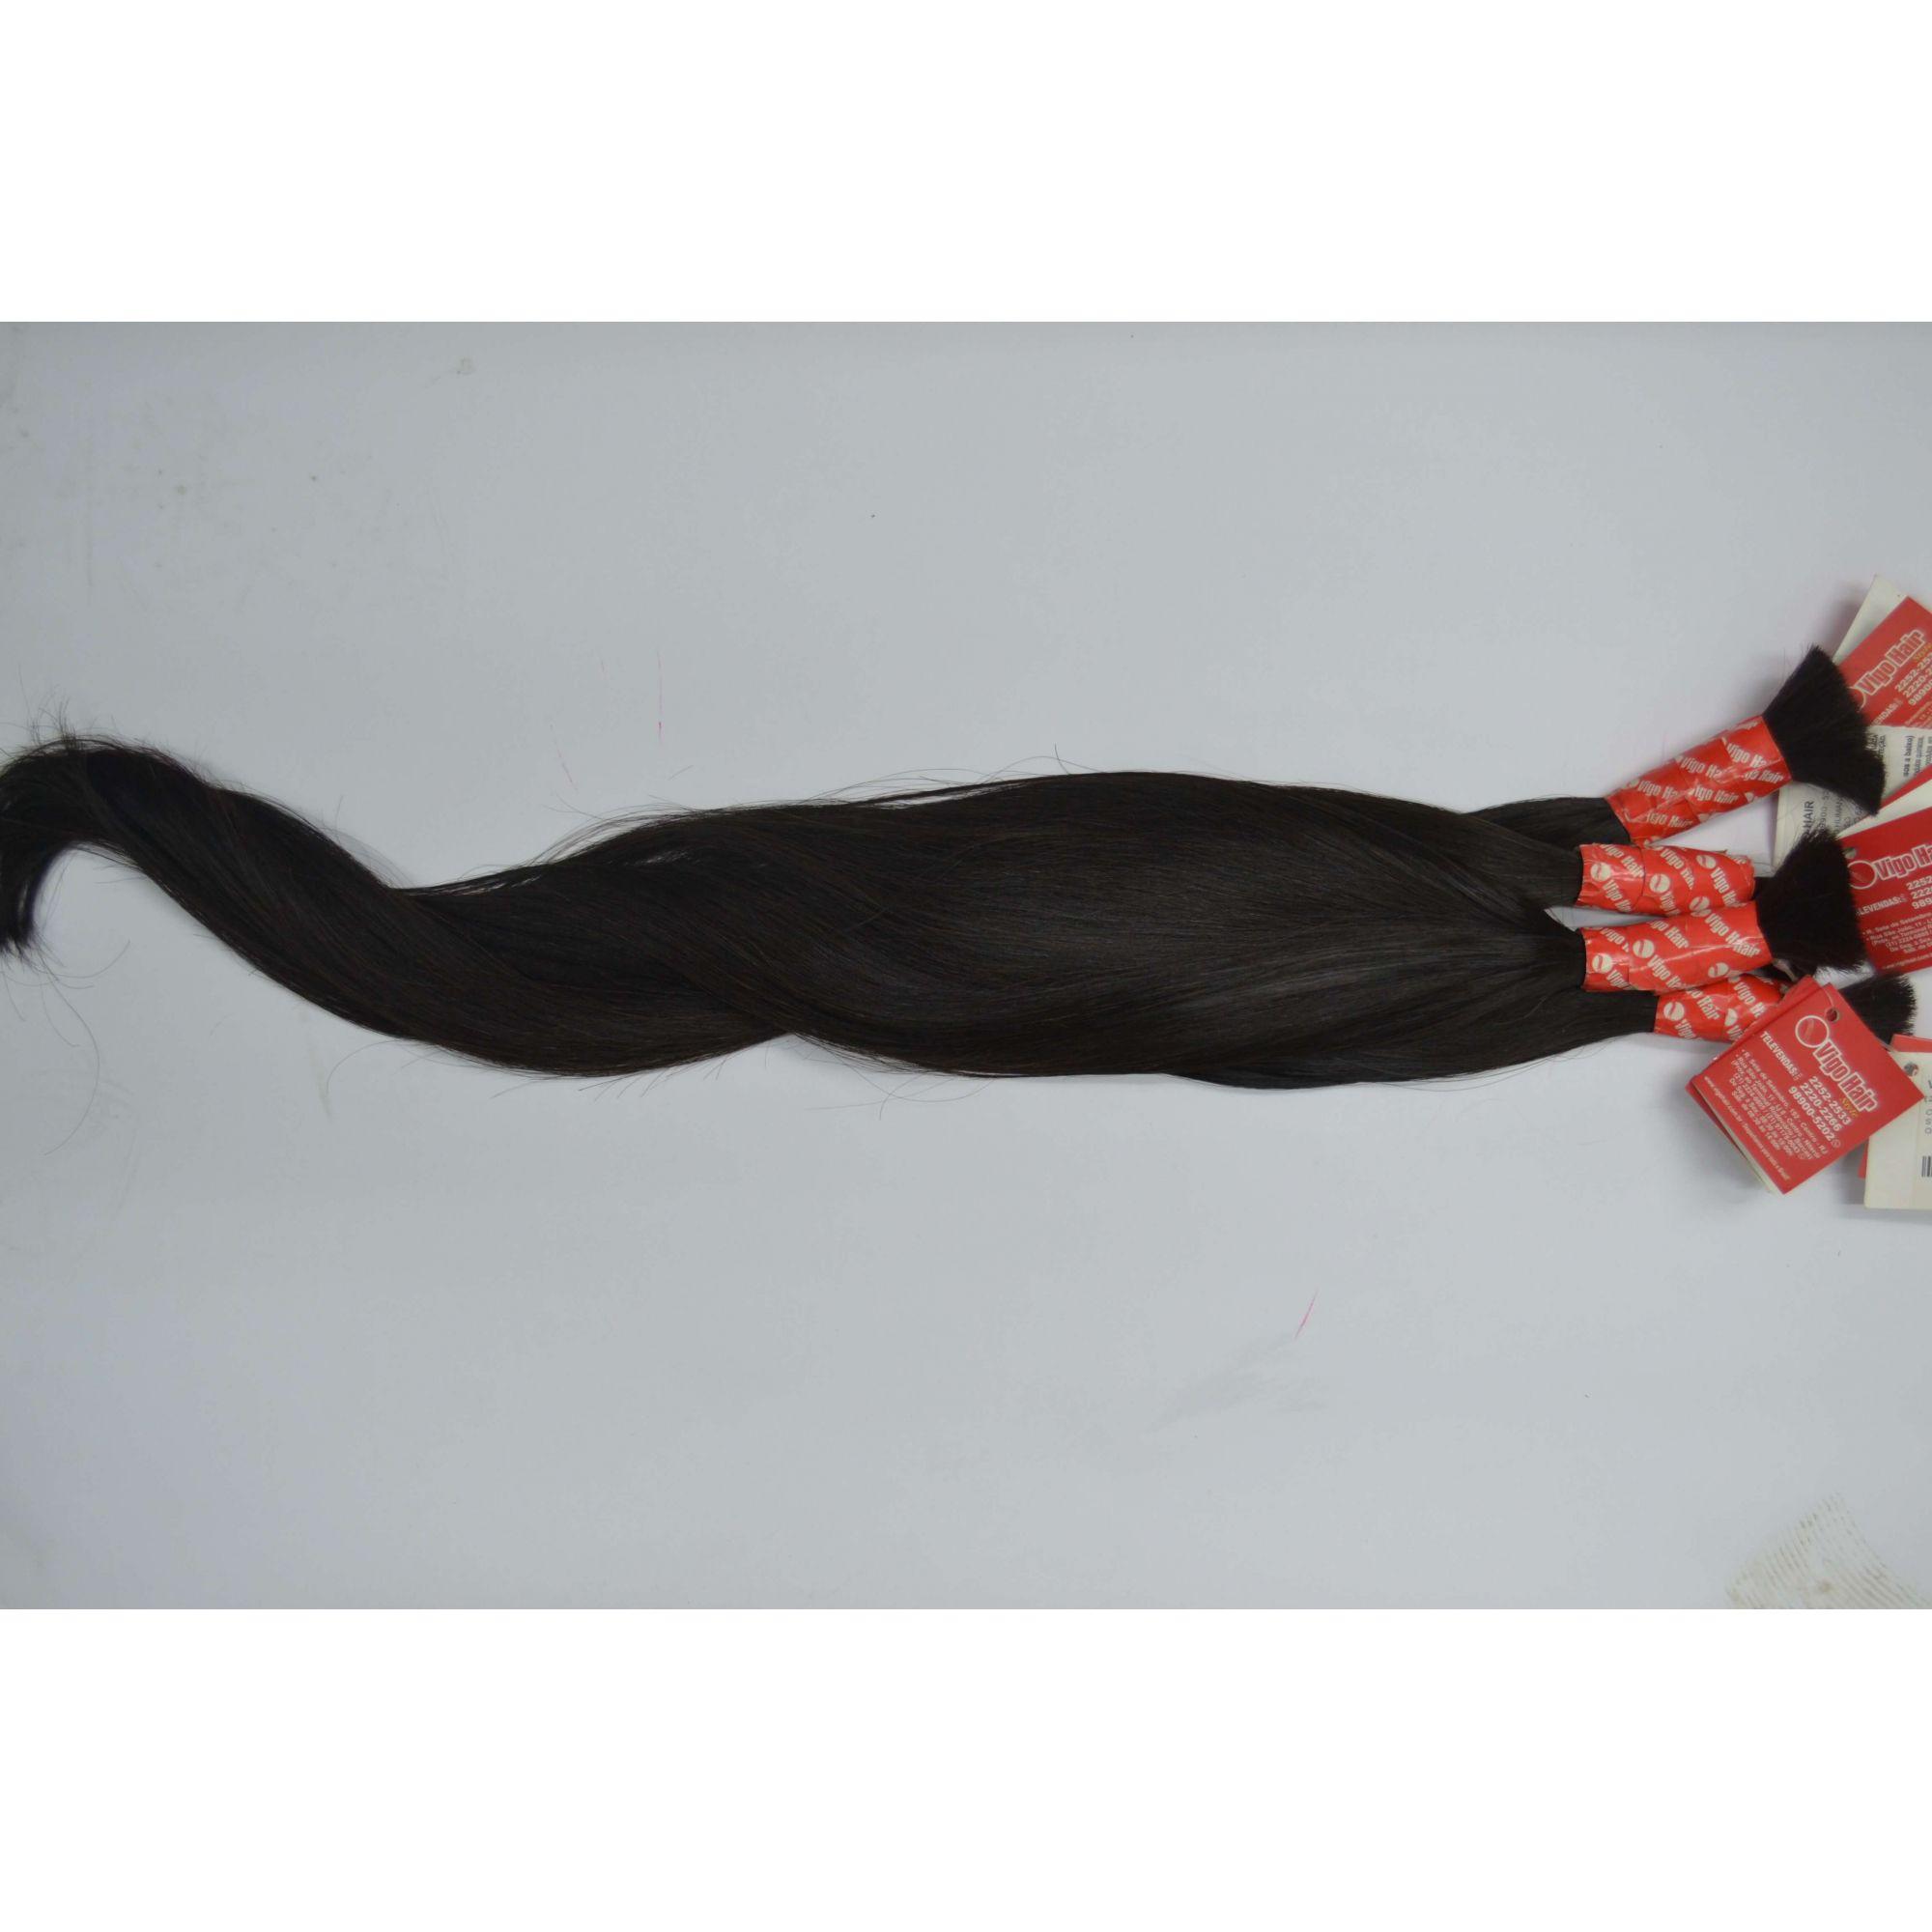 Cabelo Humano - Style Liso Ondulado (50 gramas)